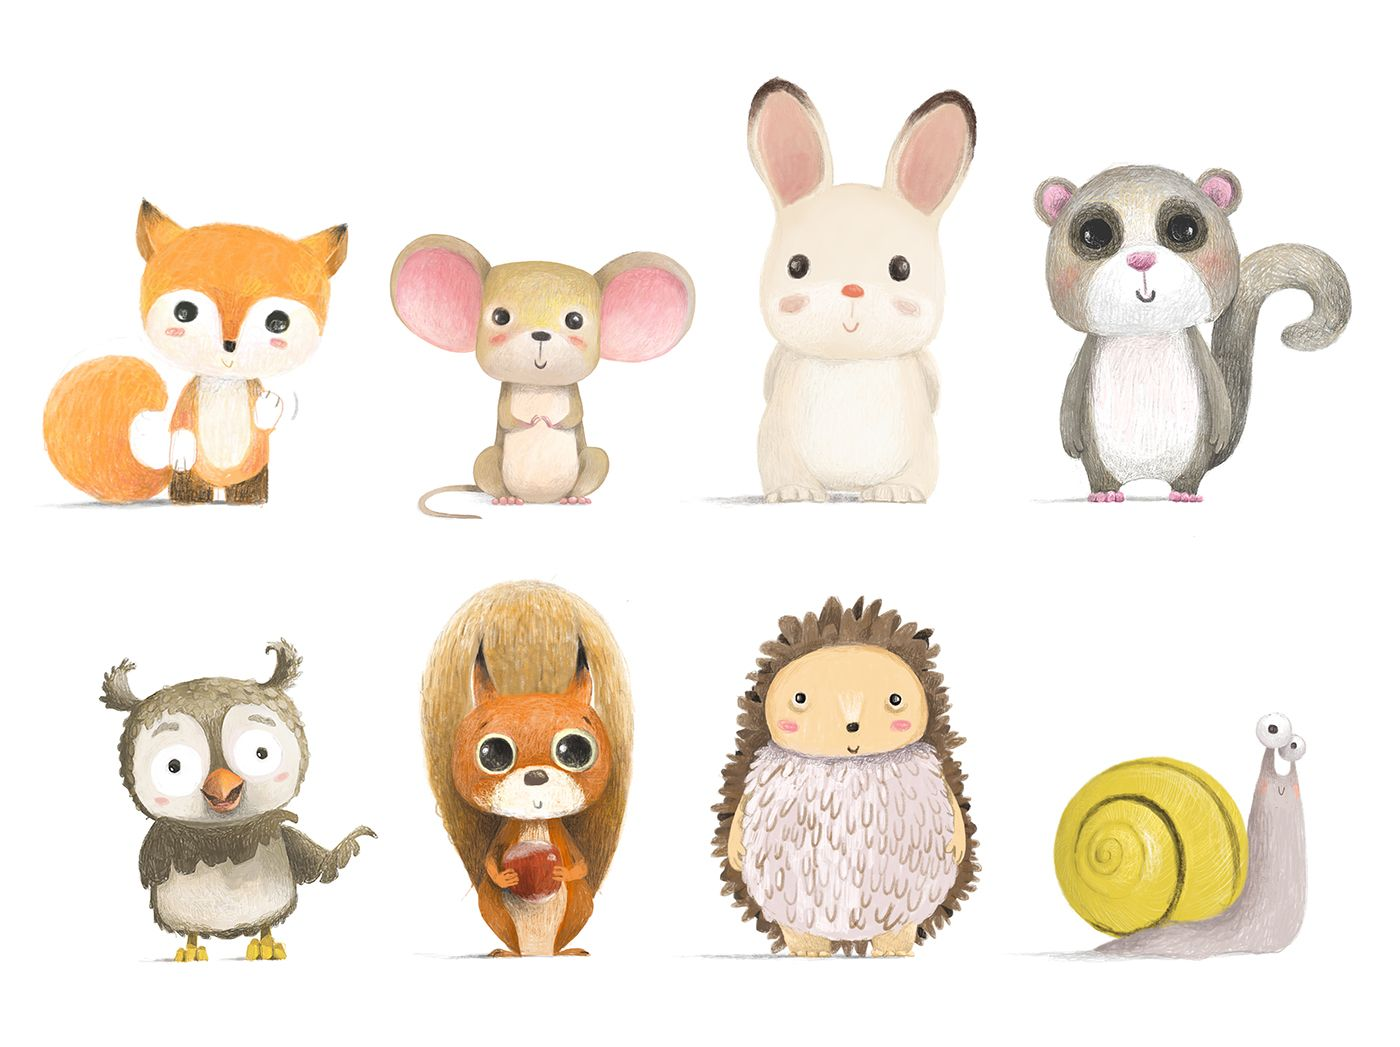 Illustration, Character Design, Cartooning // CUTE FOREST